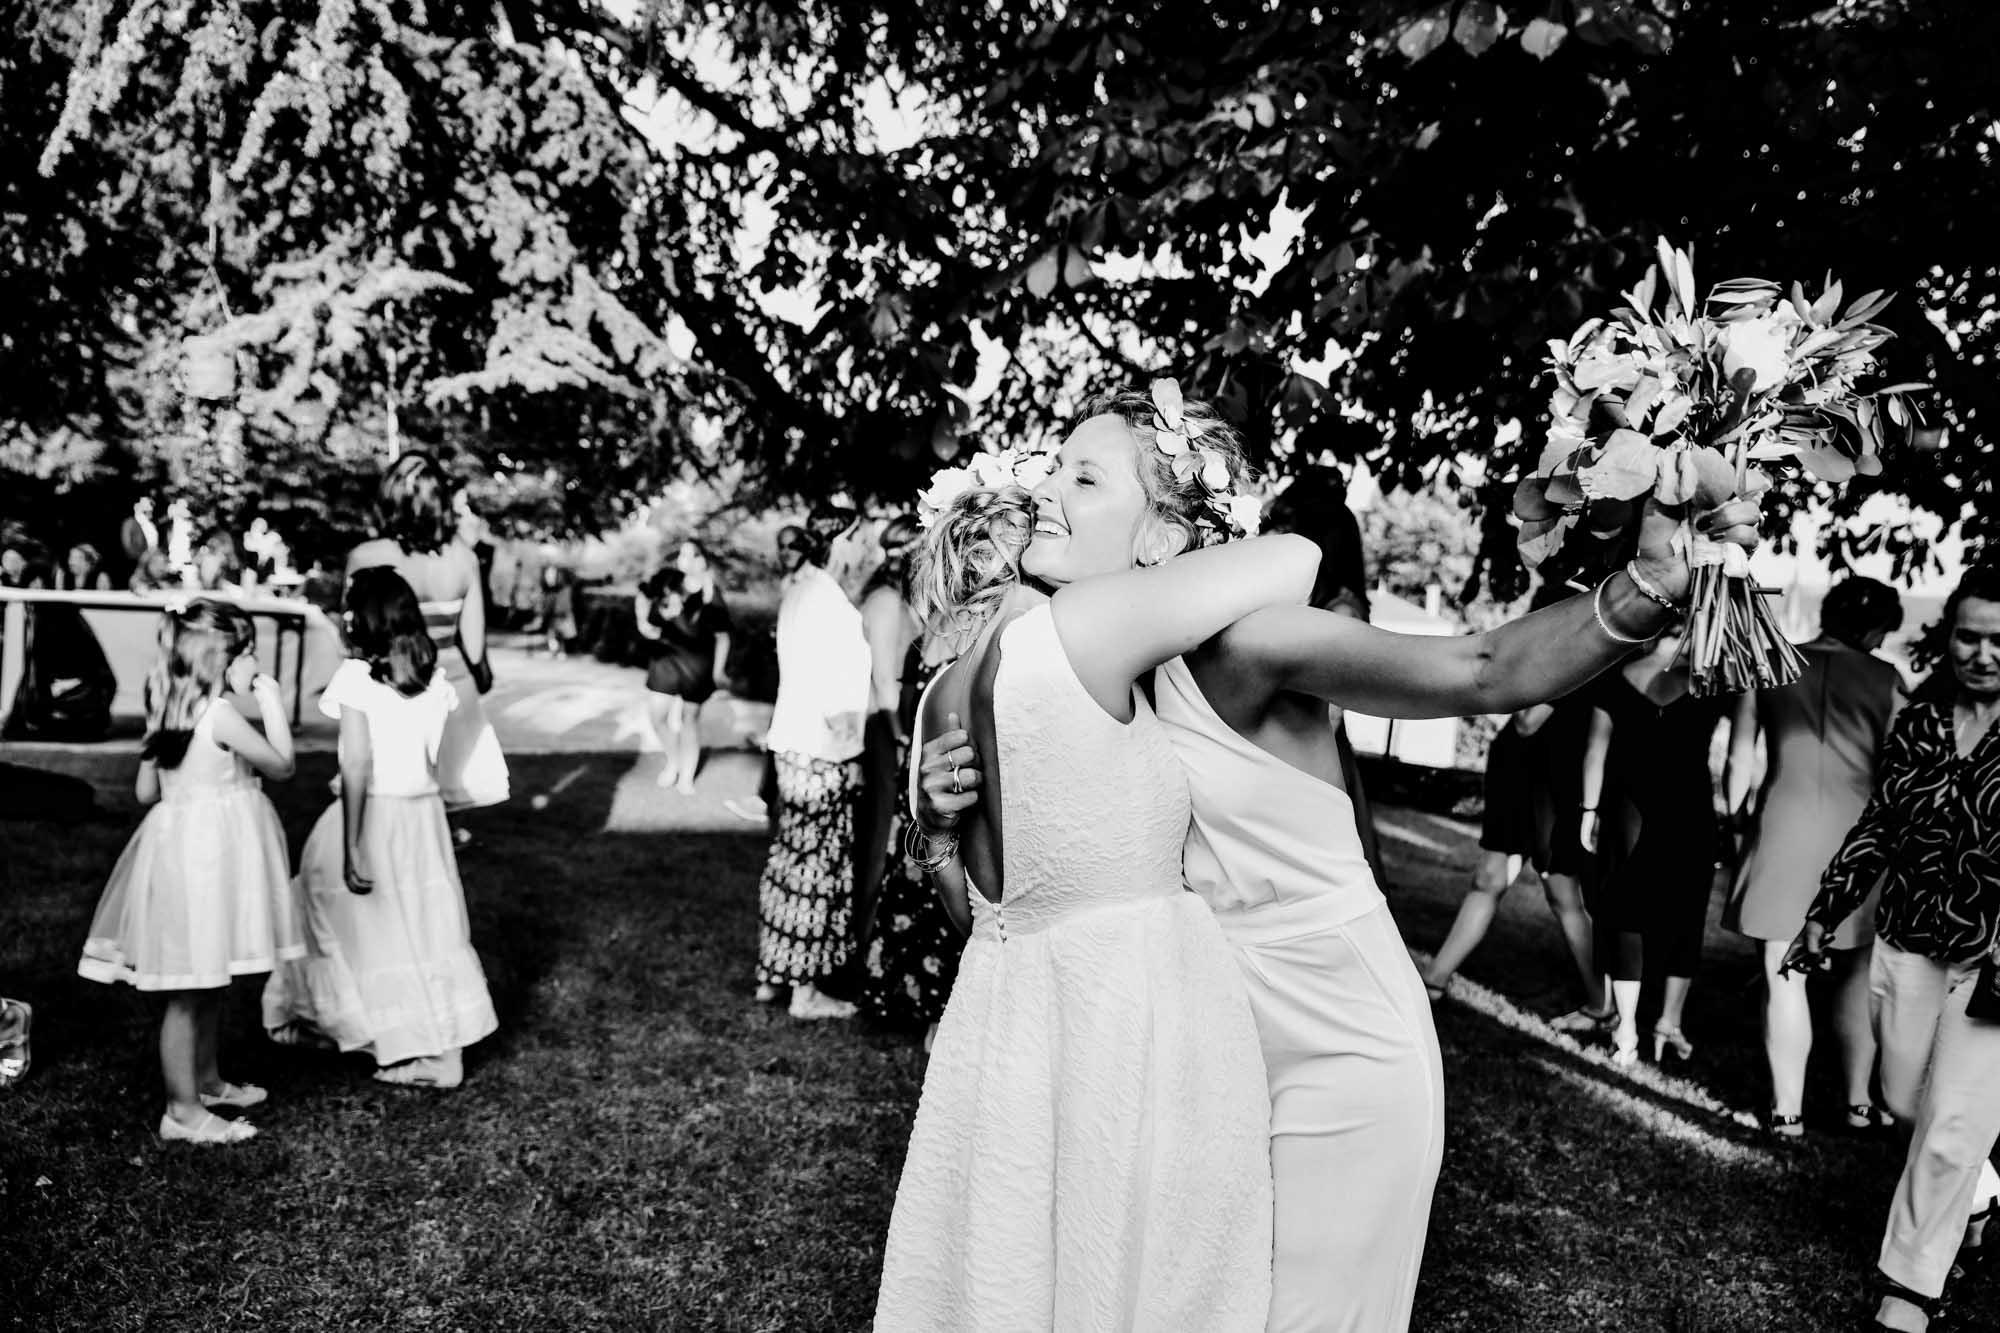 2018-07-21 - LD8_0647 - photographe mariage lyon - laurie diaz - www.lauriediazweeding.com.jpg